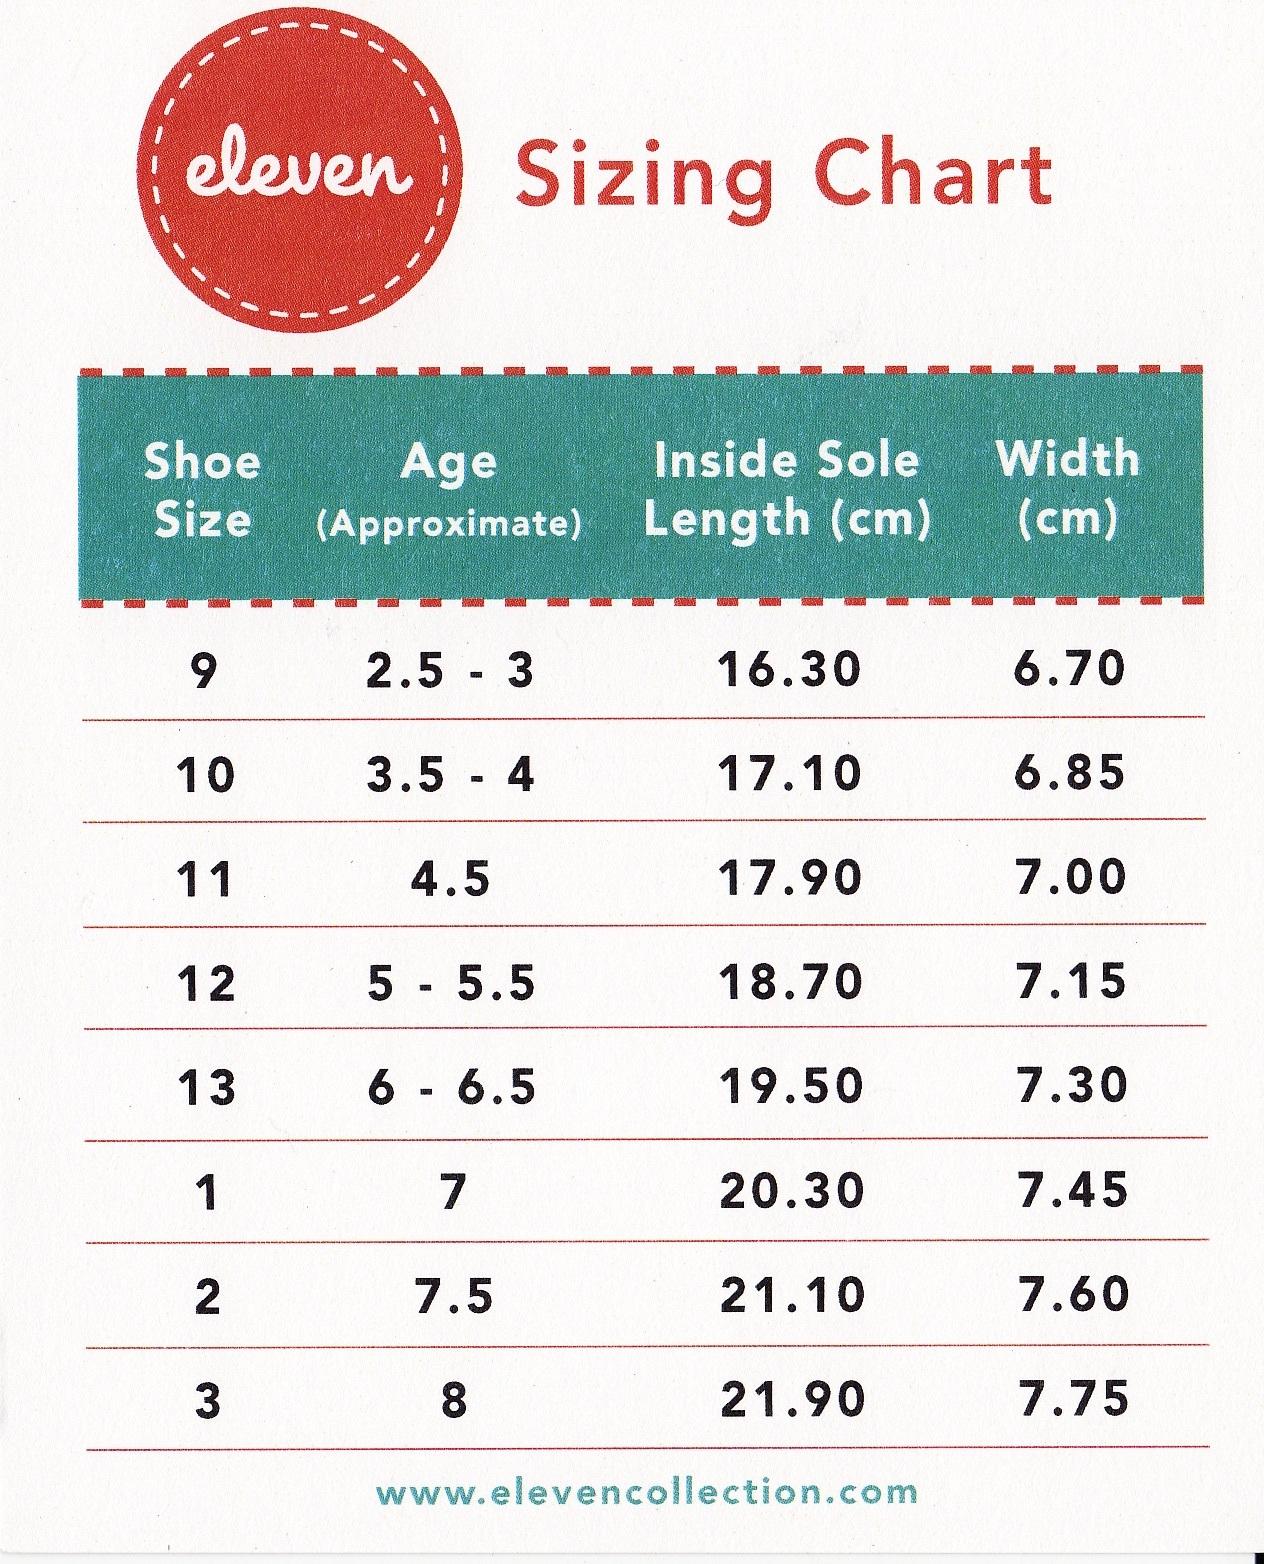 Normal Shoe Size Measureents